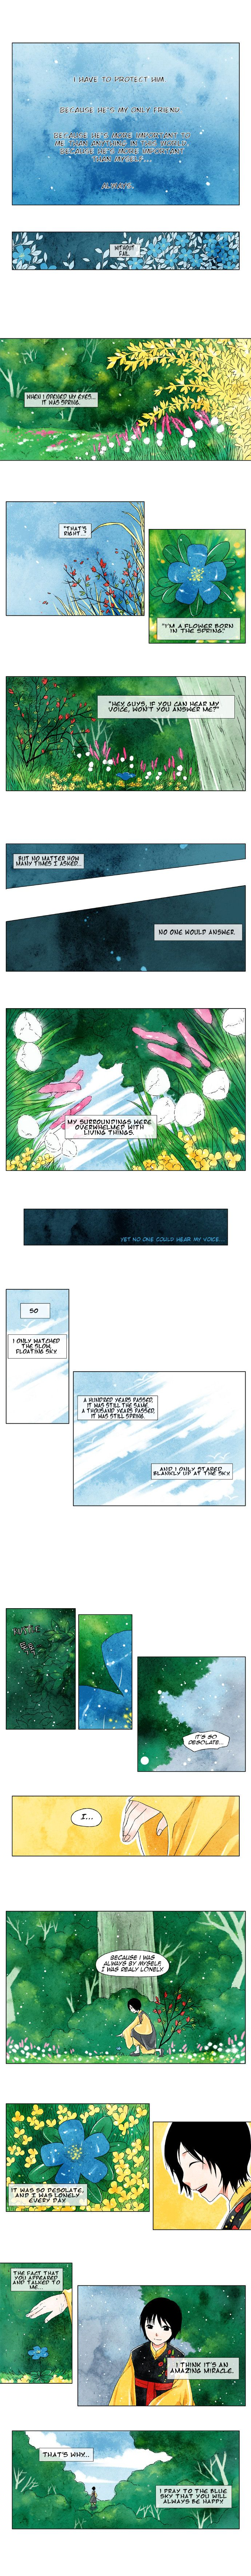 Star's Last Wish 2 Page 3